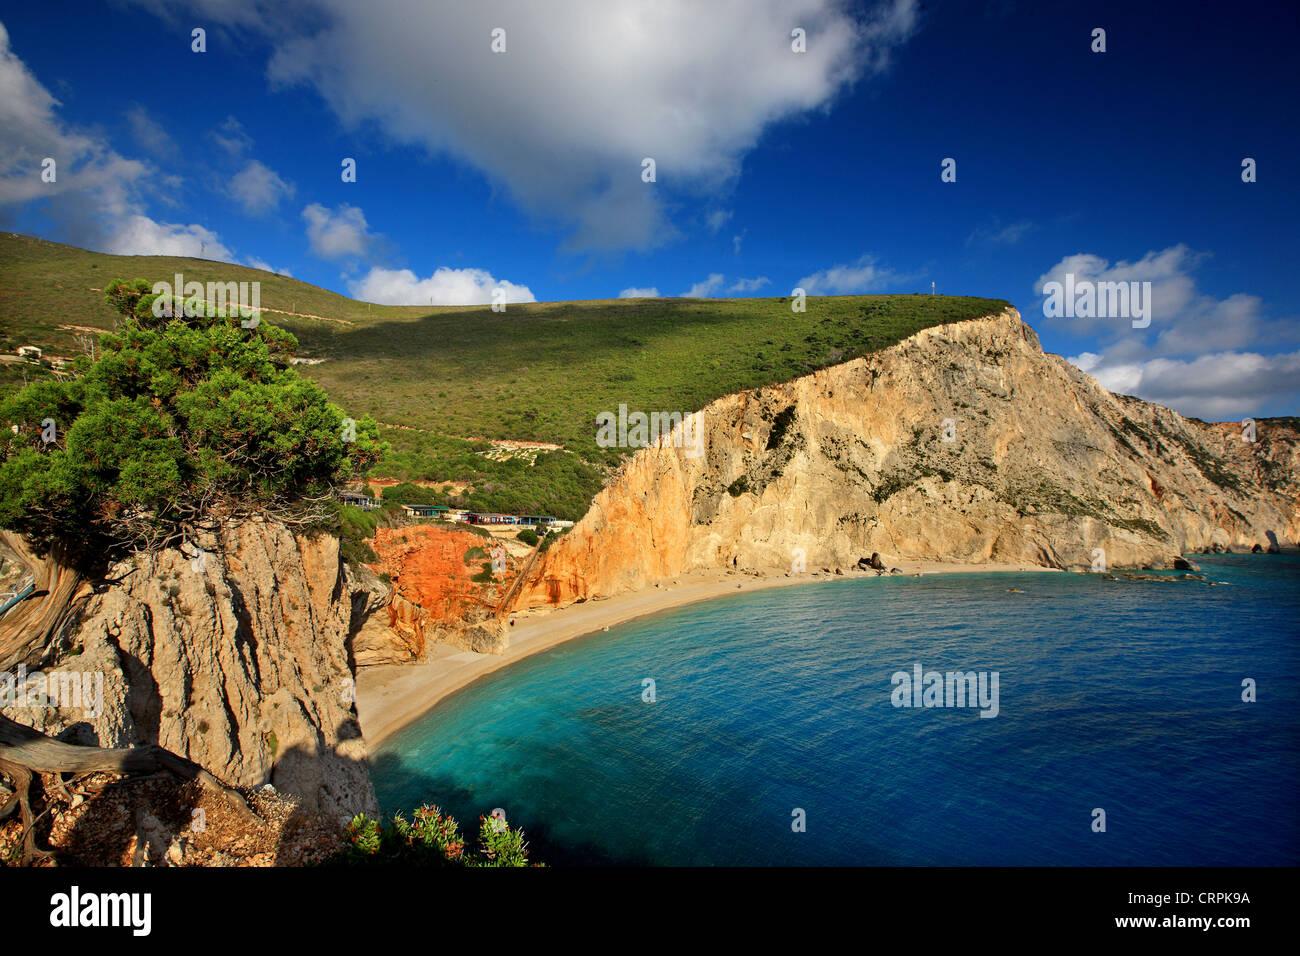 World famous Porto Katsiki beach ('off season'), Lefkada (or 'Lefkas') island, Ionian Sea, Eptanisa - Stock Image